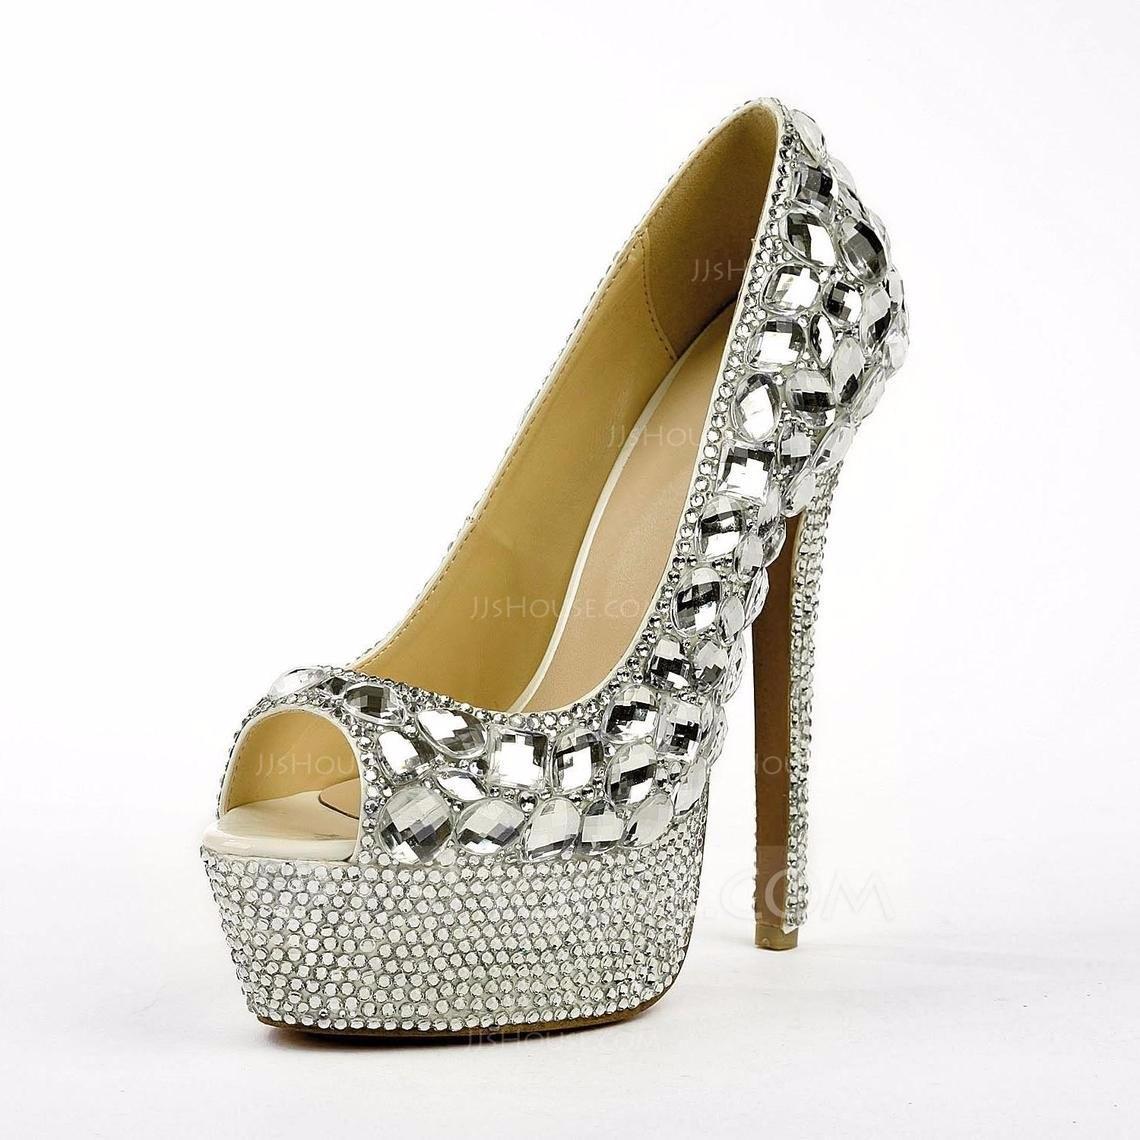 99d1d5726de sapato noiva debutante festa strass prata. Carregando zoom.